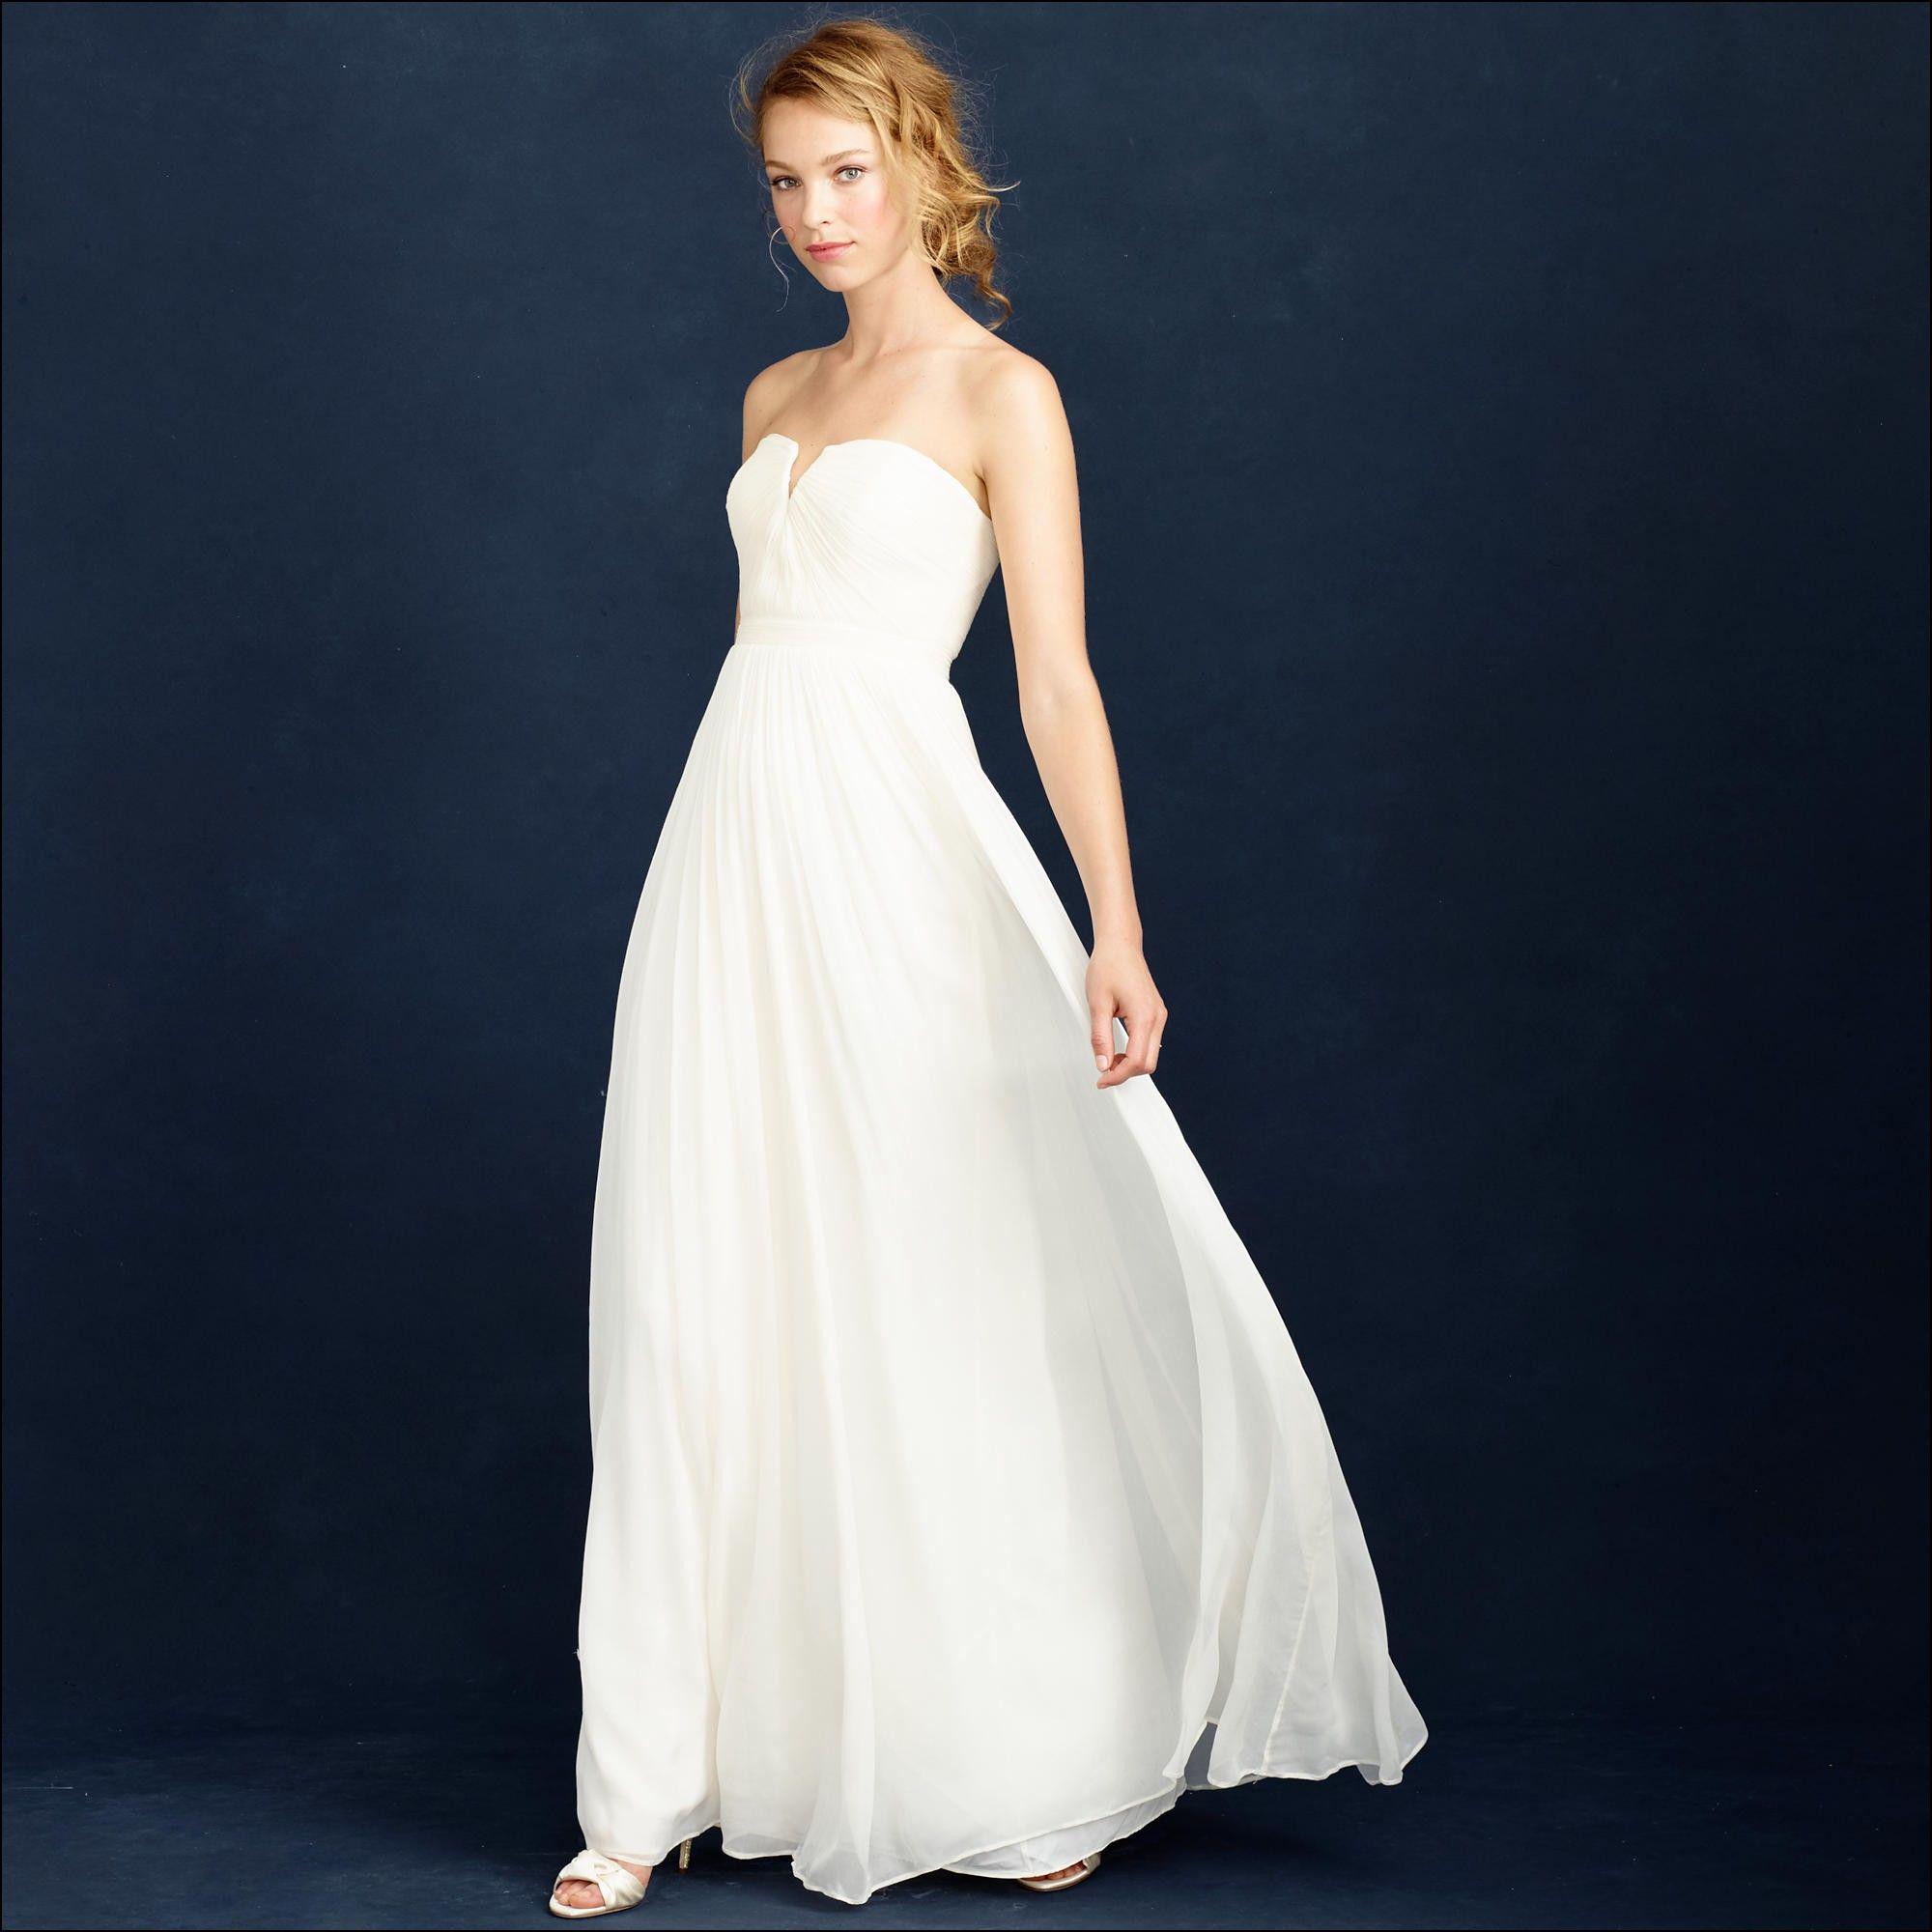 J Crew Bridesmaid Dresses Sale   Dresses and Gowns Ideas   Pinterest ...